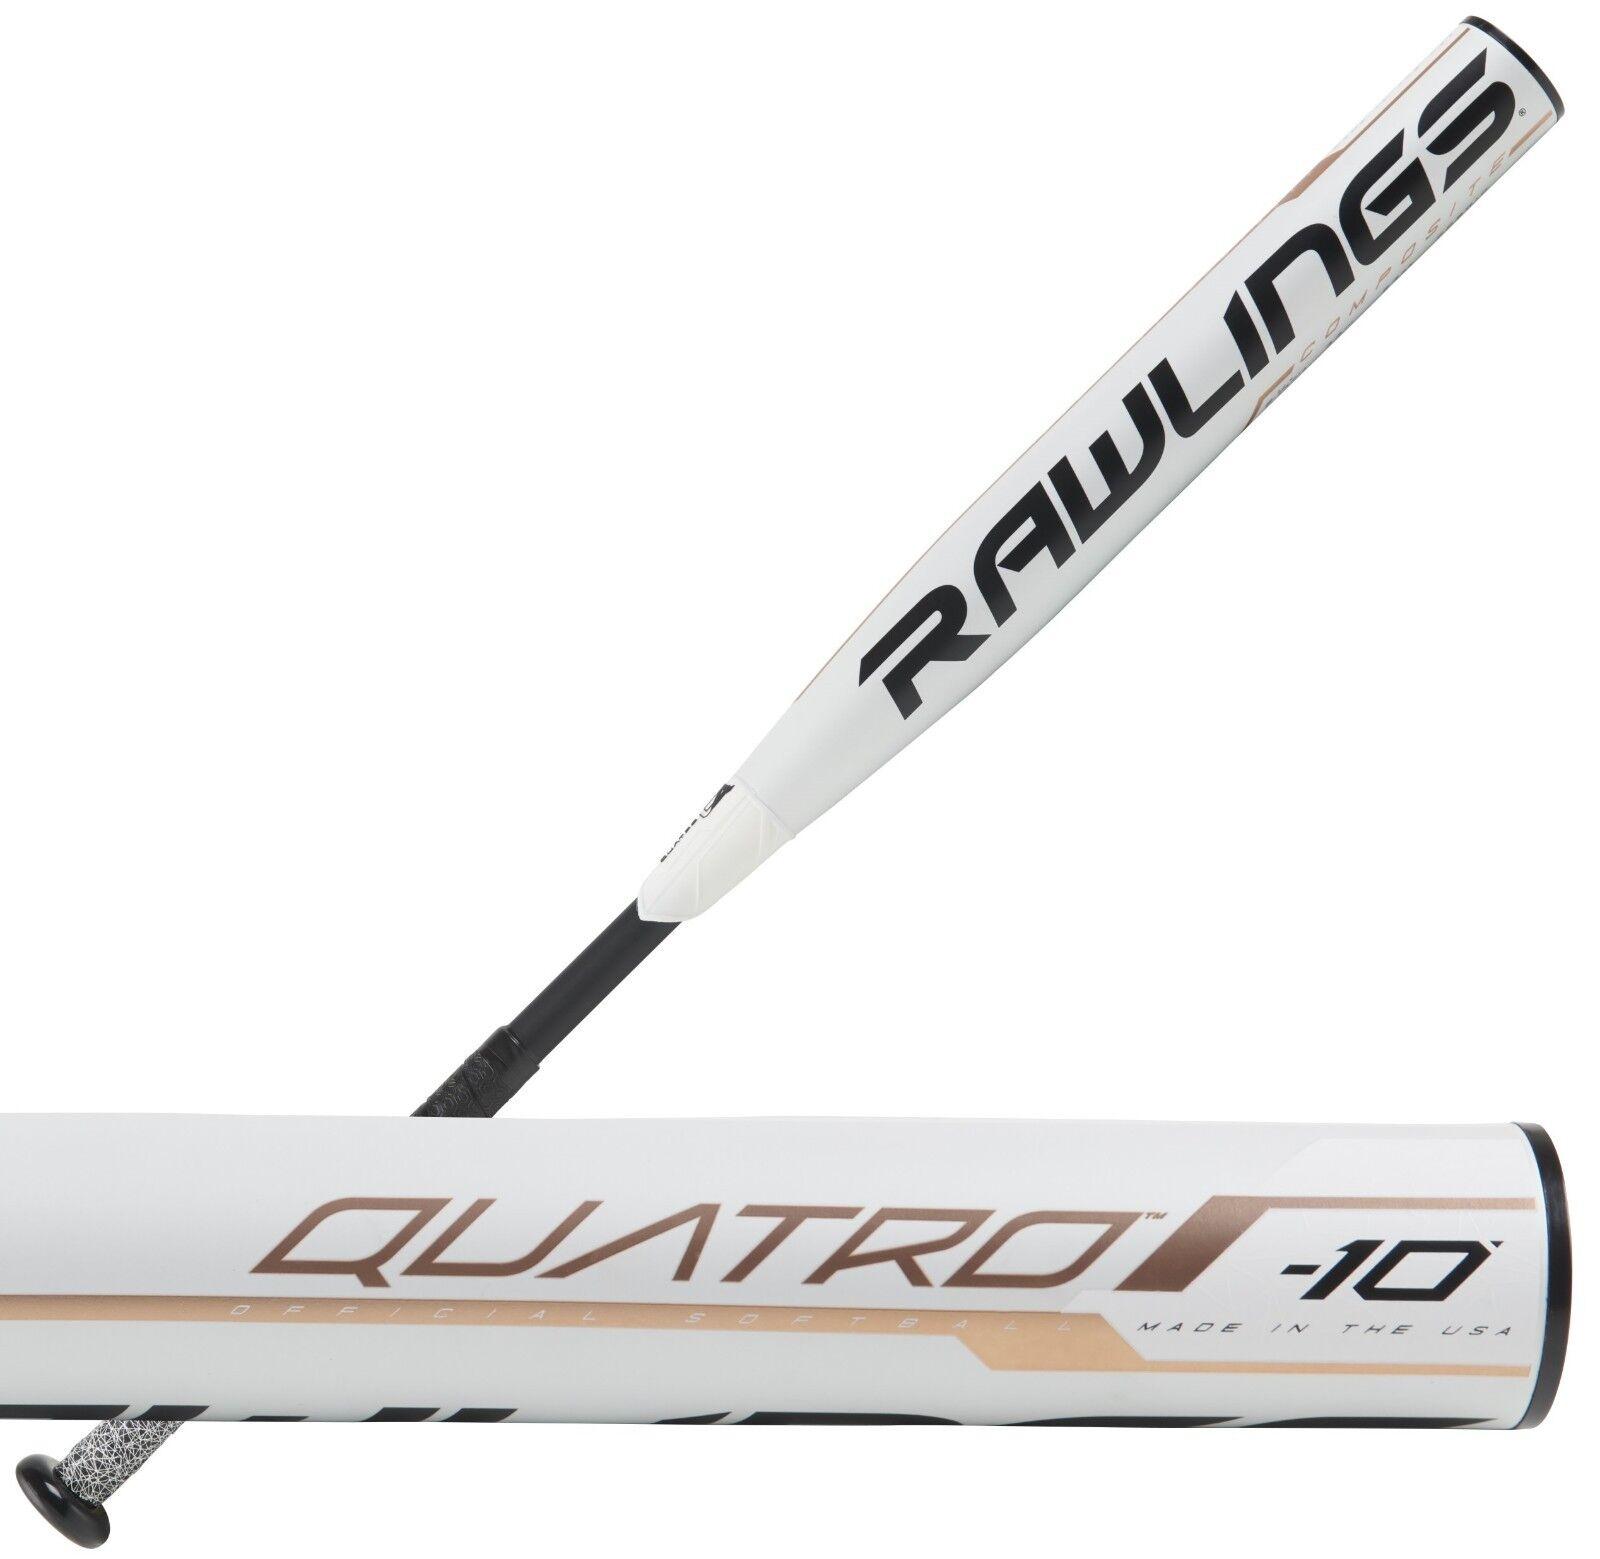 2019 Rawlings Quatro -10 31  21 oz. Women's Fastpitch Softball Bat FP9Q10